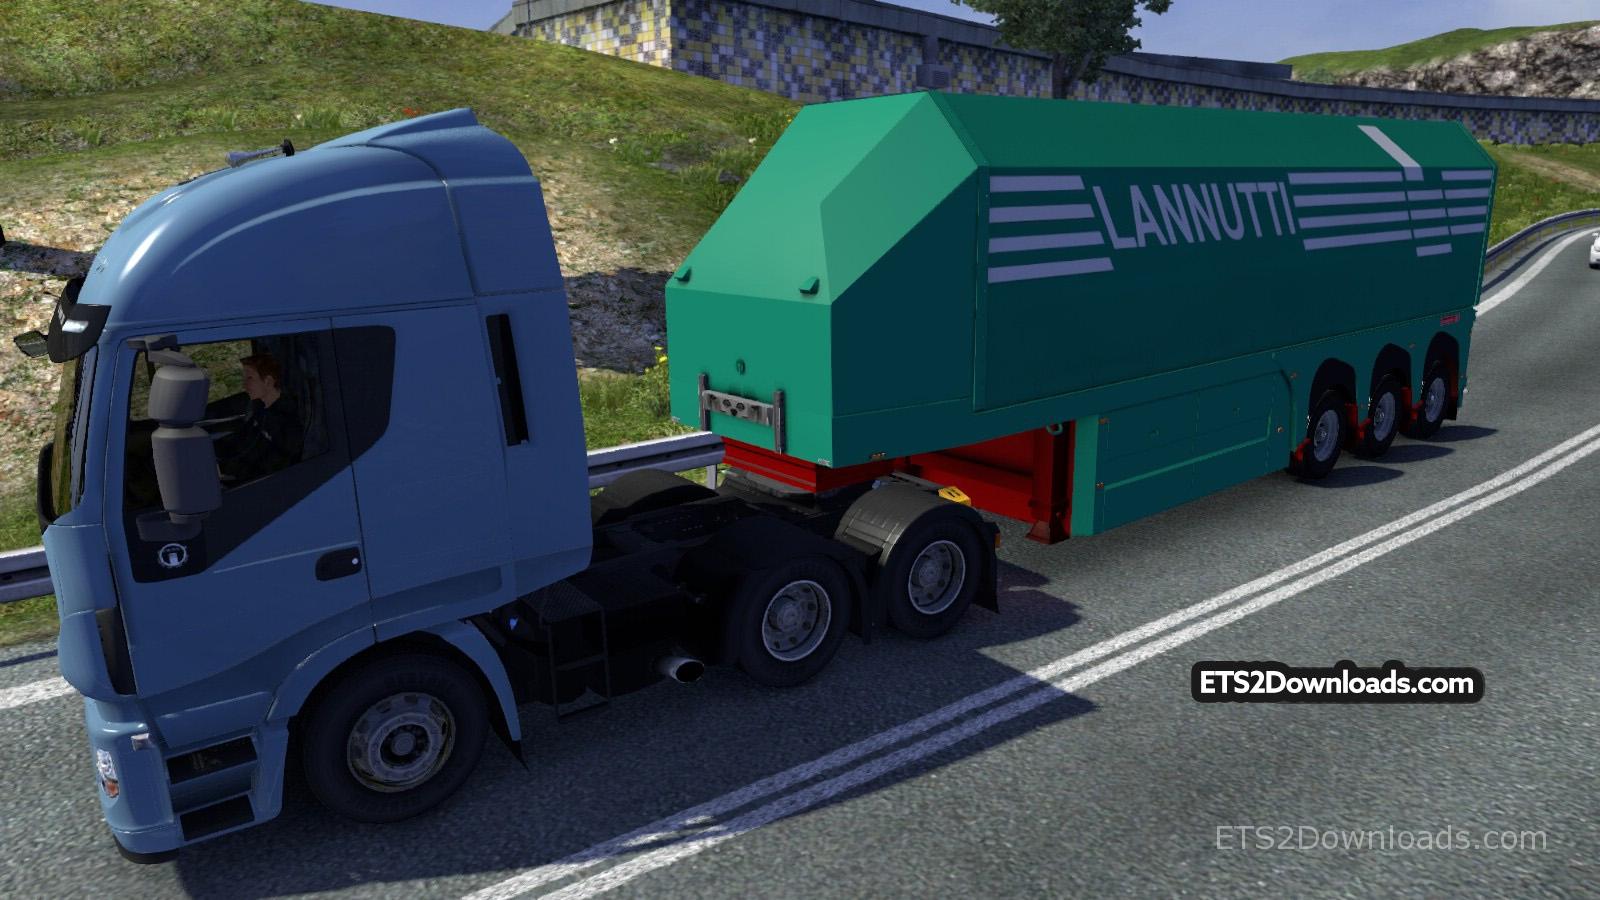 lannutti-glass-trailer-2